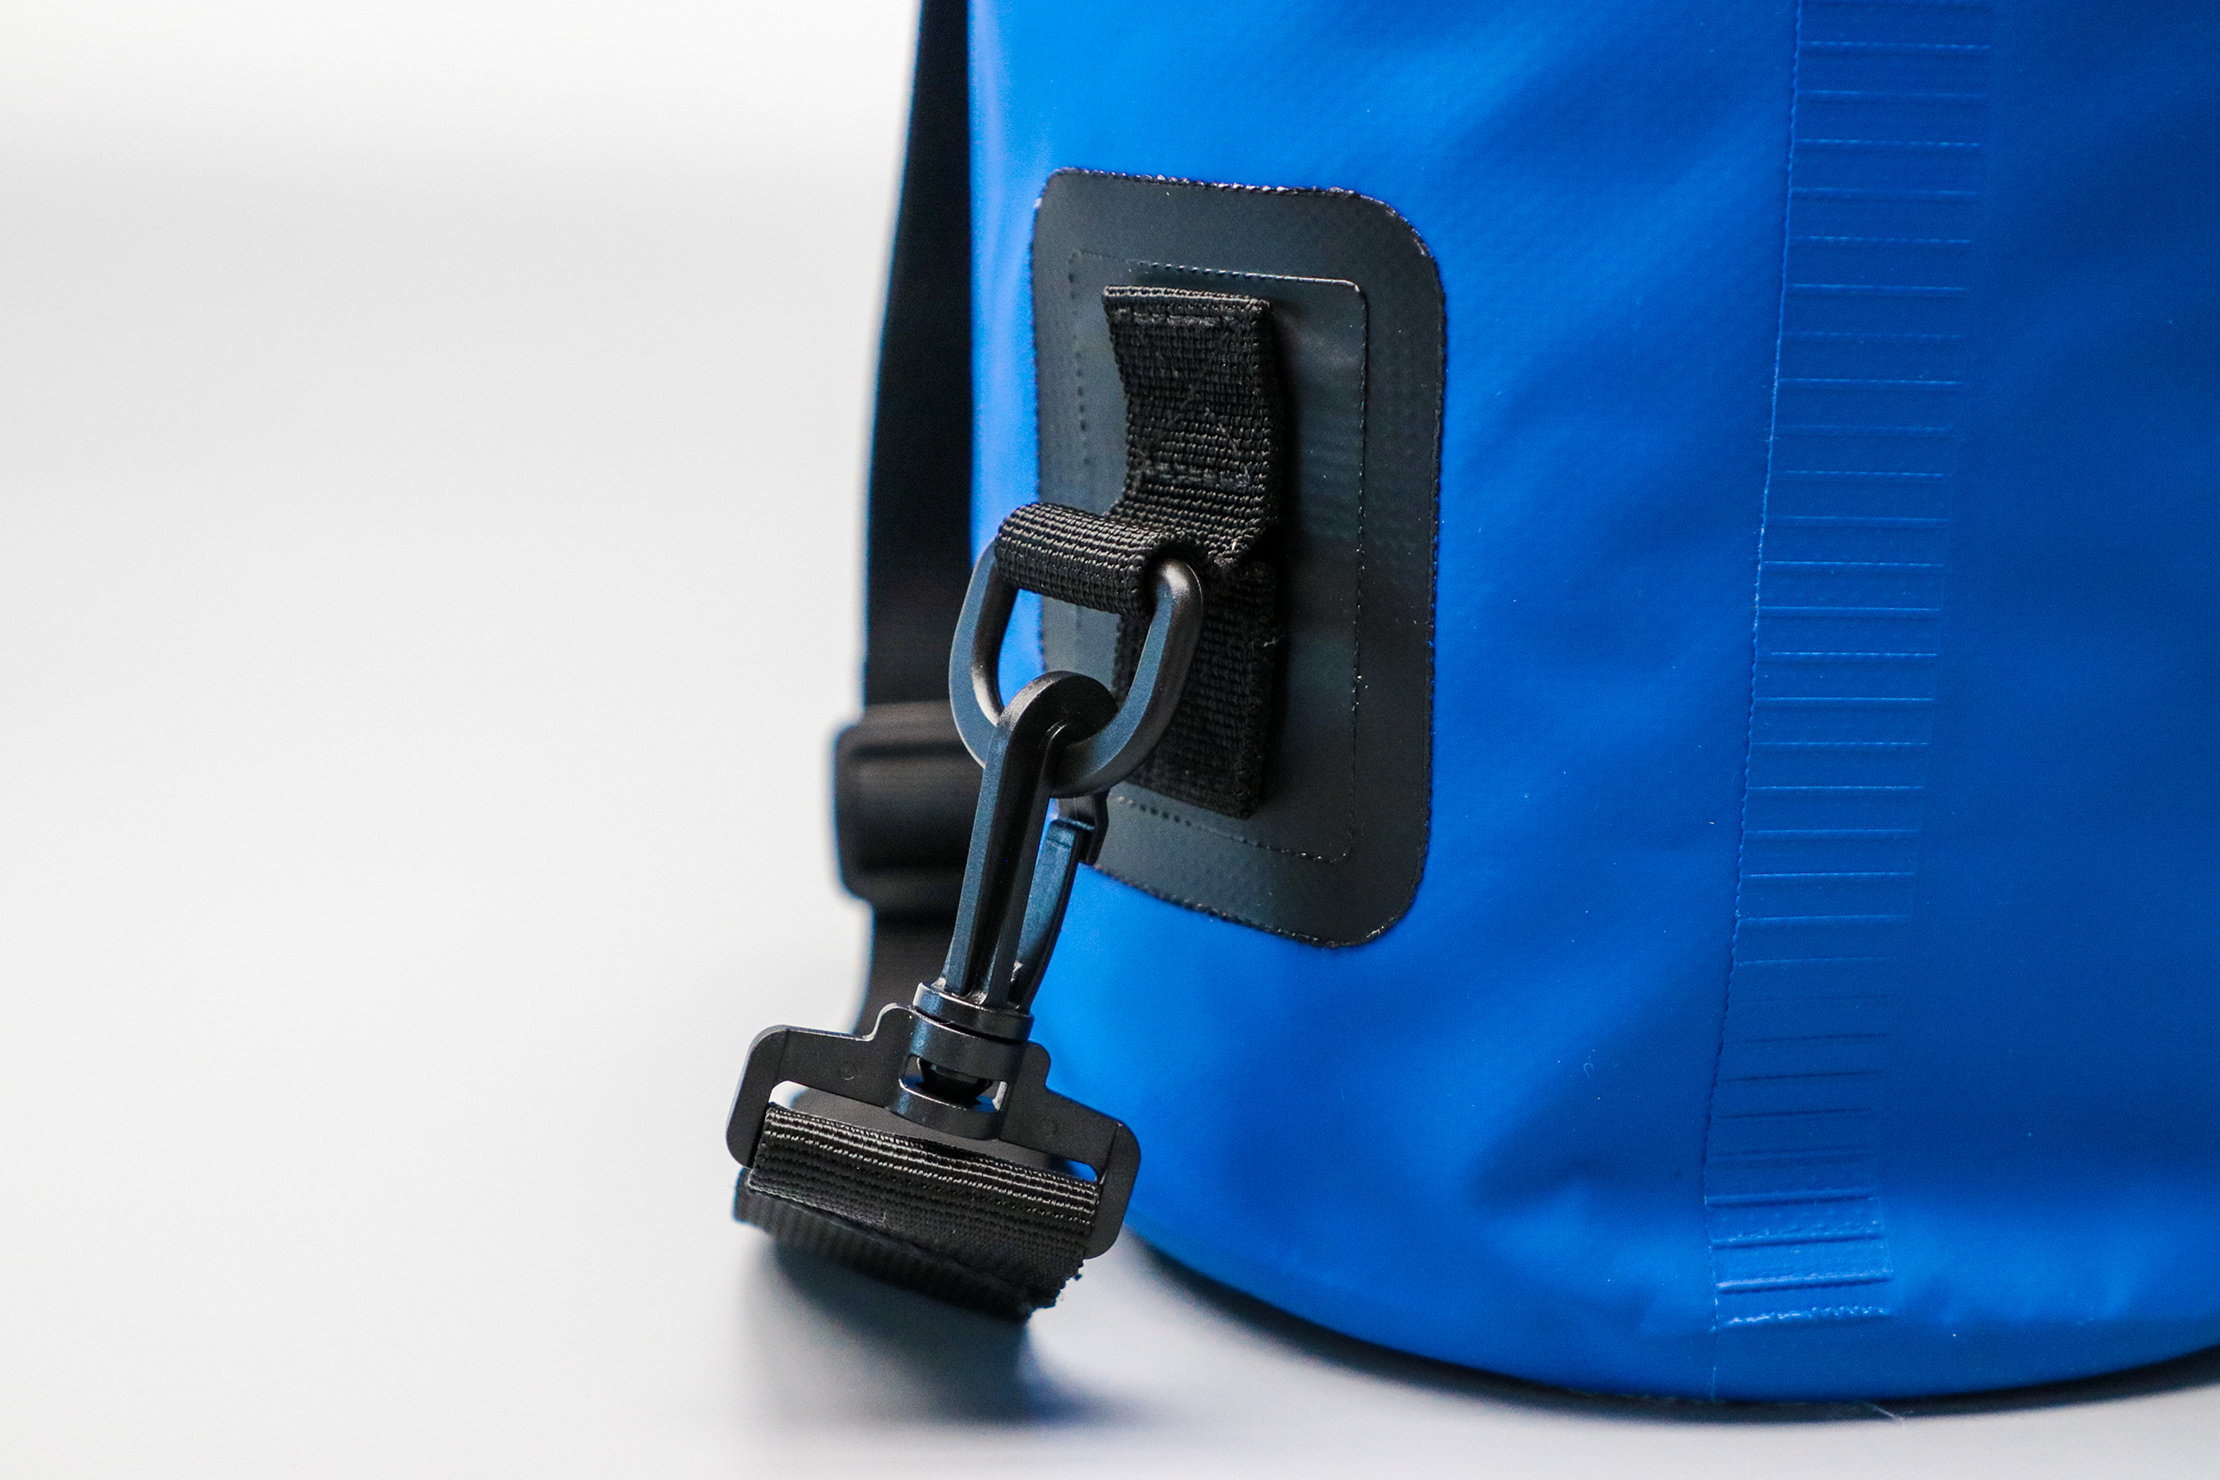 Earth Pak Original Waterproof Dry Bag Carabiner Snapped On